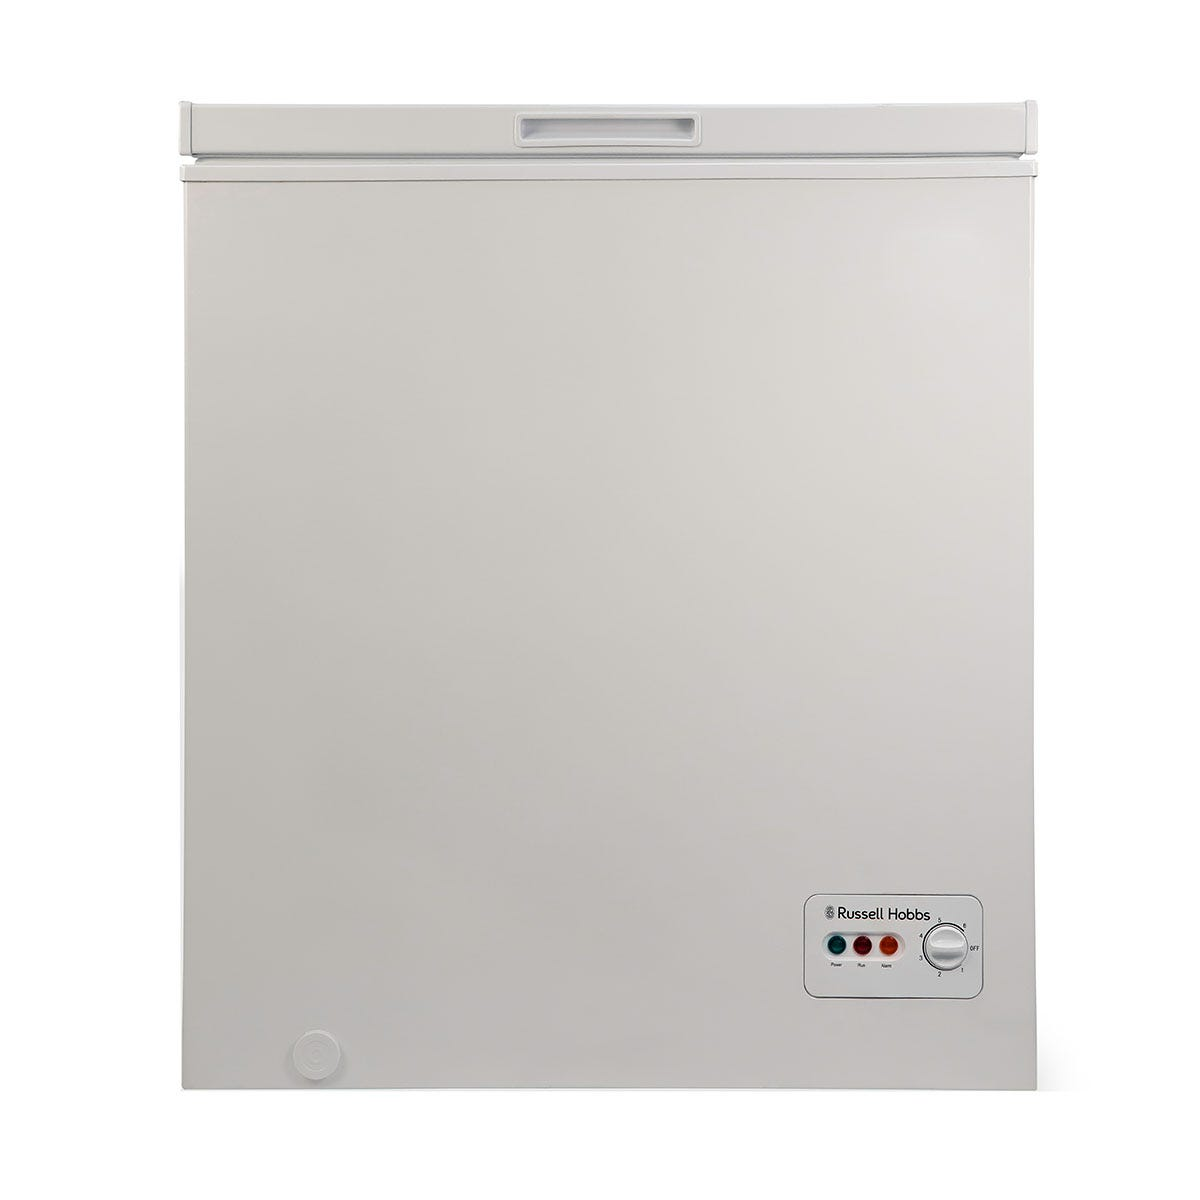 Russell Hobbs RHCF150 142L Freestanding Chest Freezer - White